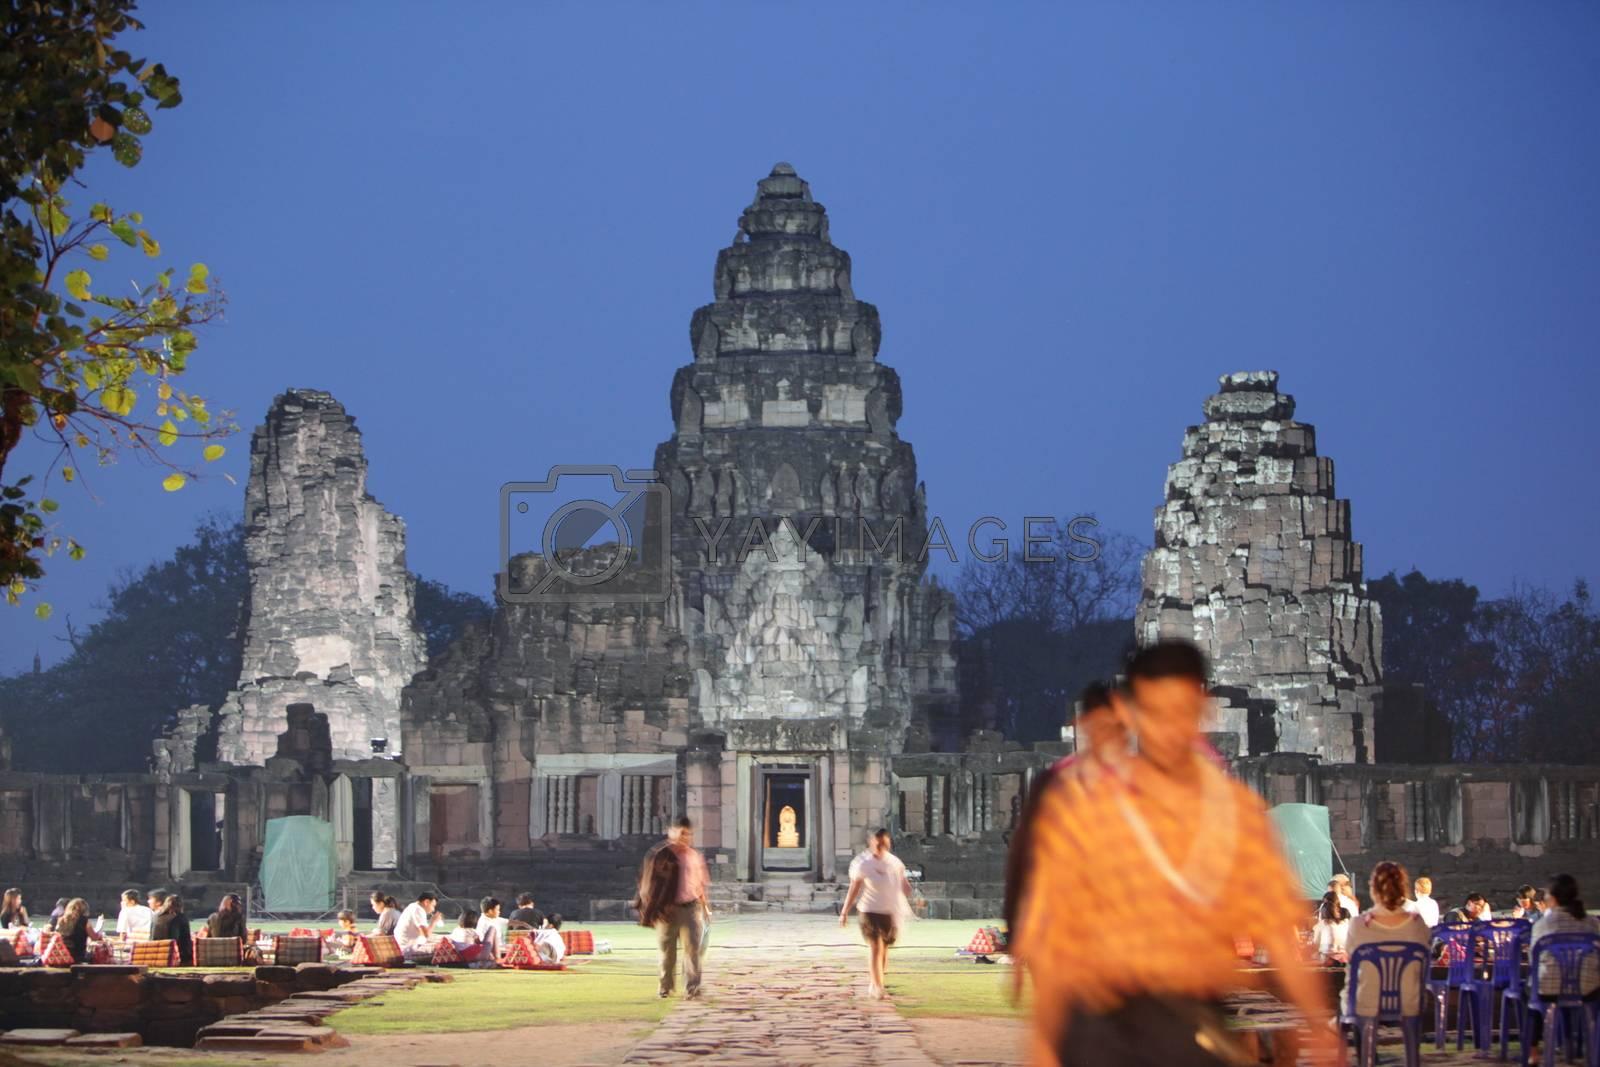 ASIA THAILAND ISAN KHORAT PHIMAI KHMER TEMPLE by urf